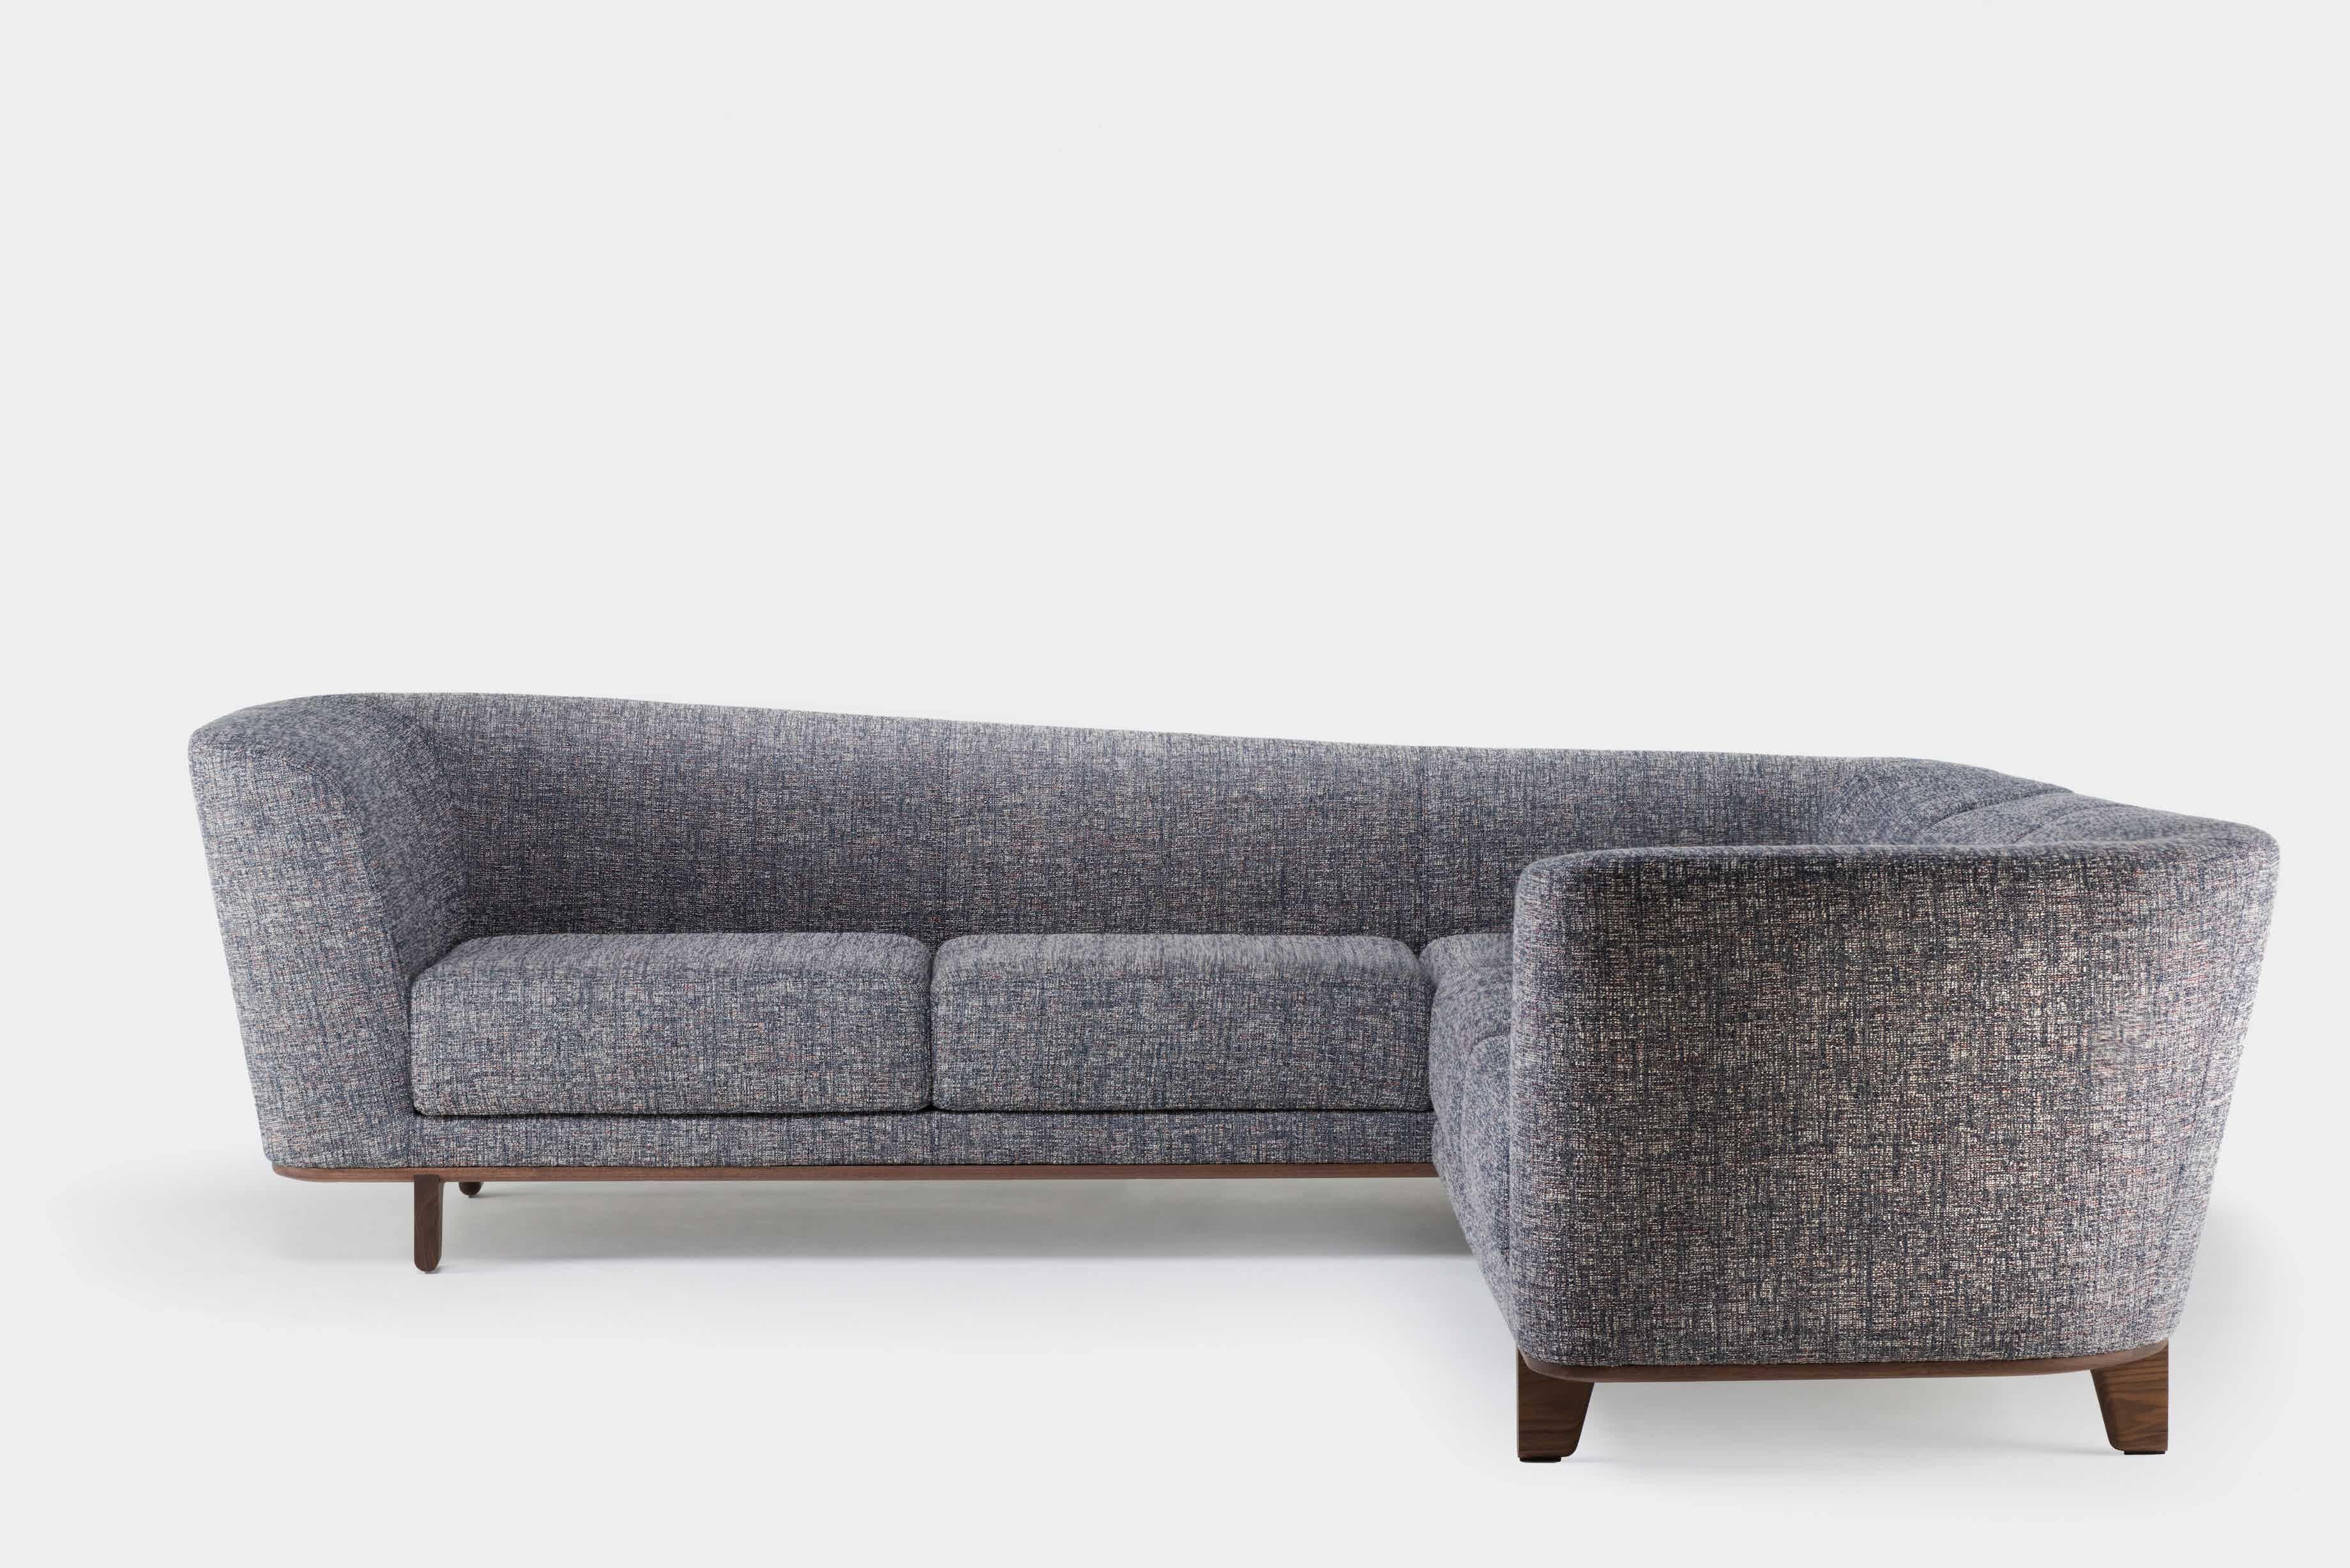 De La Espada Matthew Hilton Otley Corner Unit Sofa Haute Living